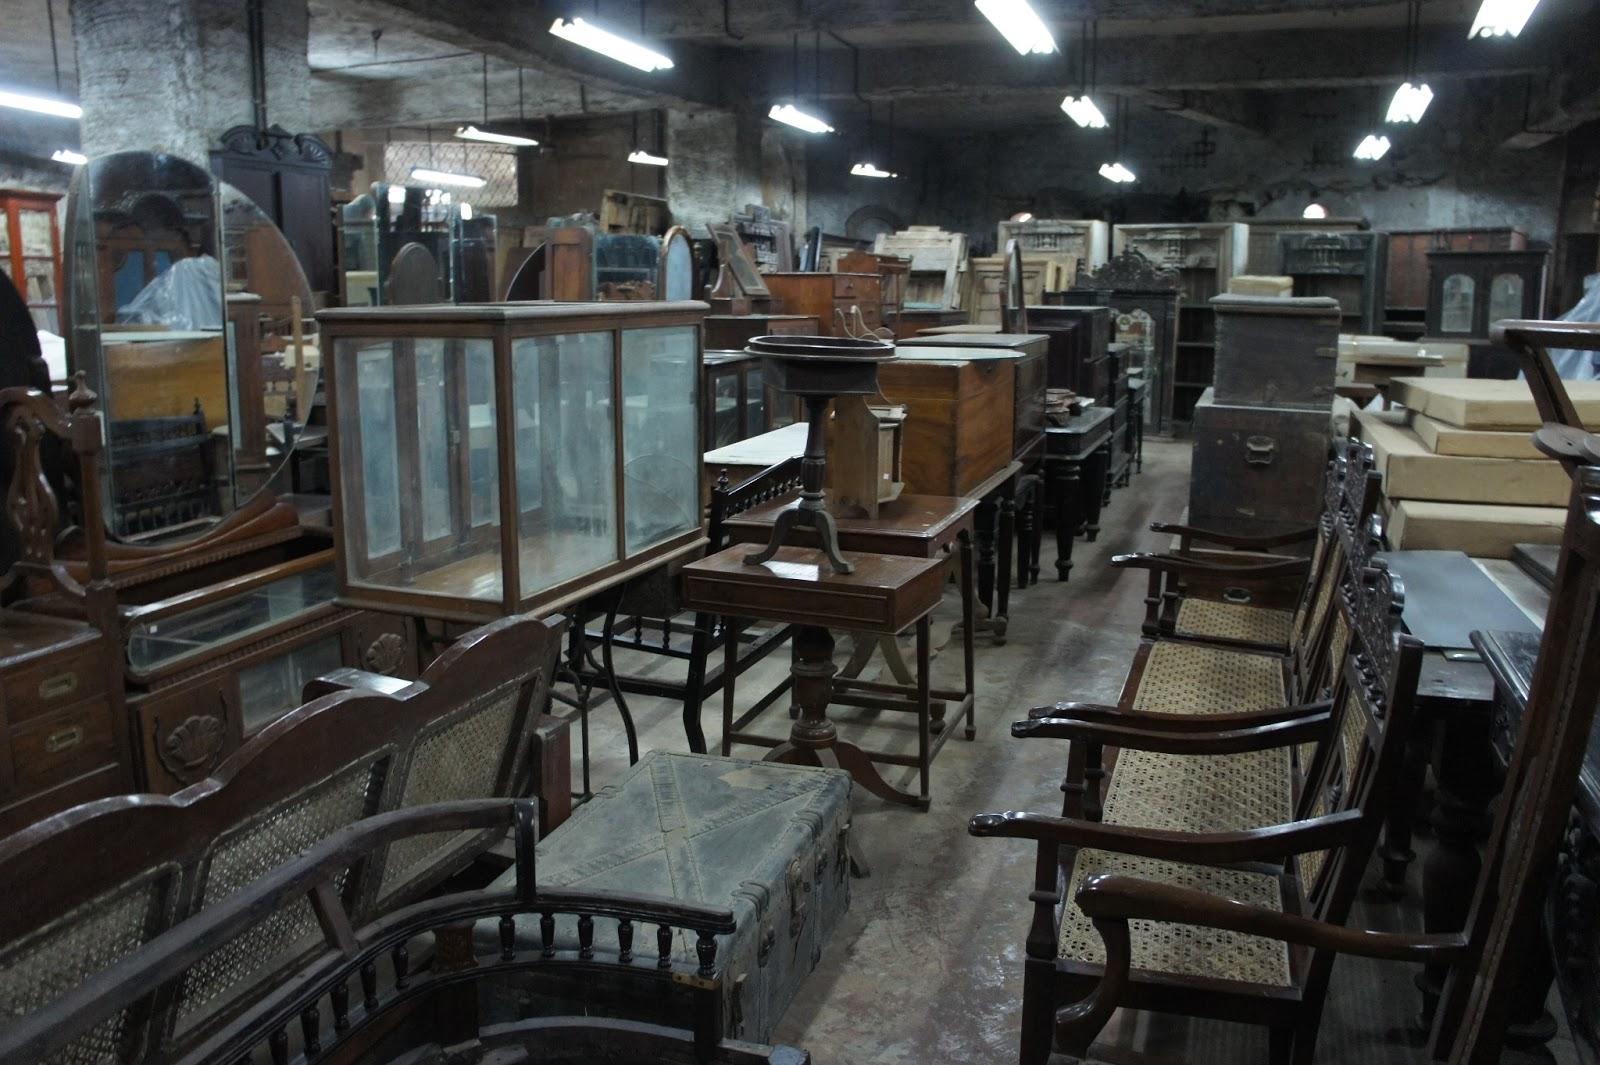 bombayjules where to buy colonial antique furniture in mumbai rh bombayjules blogspot com furniture market in mumbai bhiwandi best second hand furniture market in mumbai